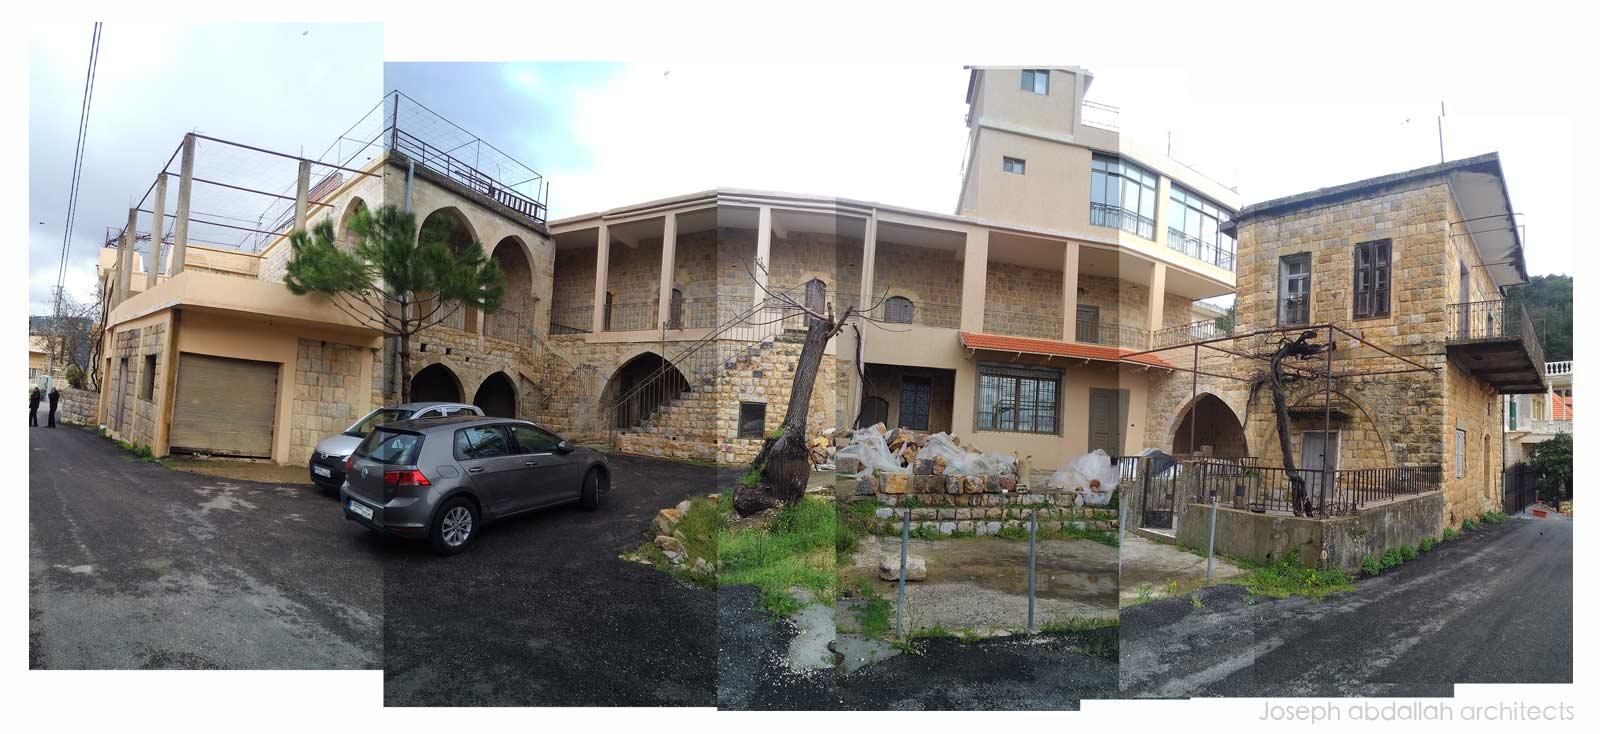 azoury-mounment-old-architecture-restoration-lebanon-joseph-abdallah-architects-2